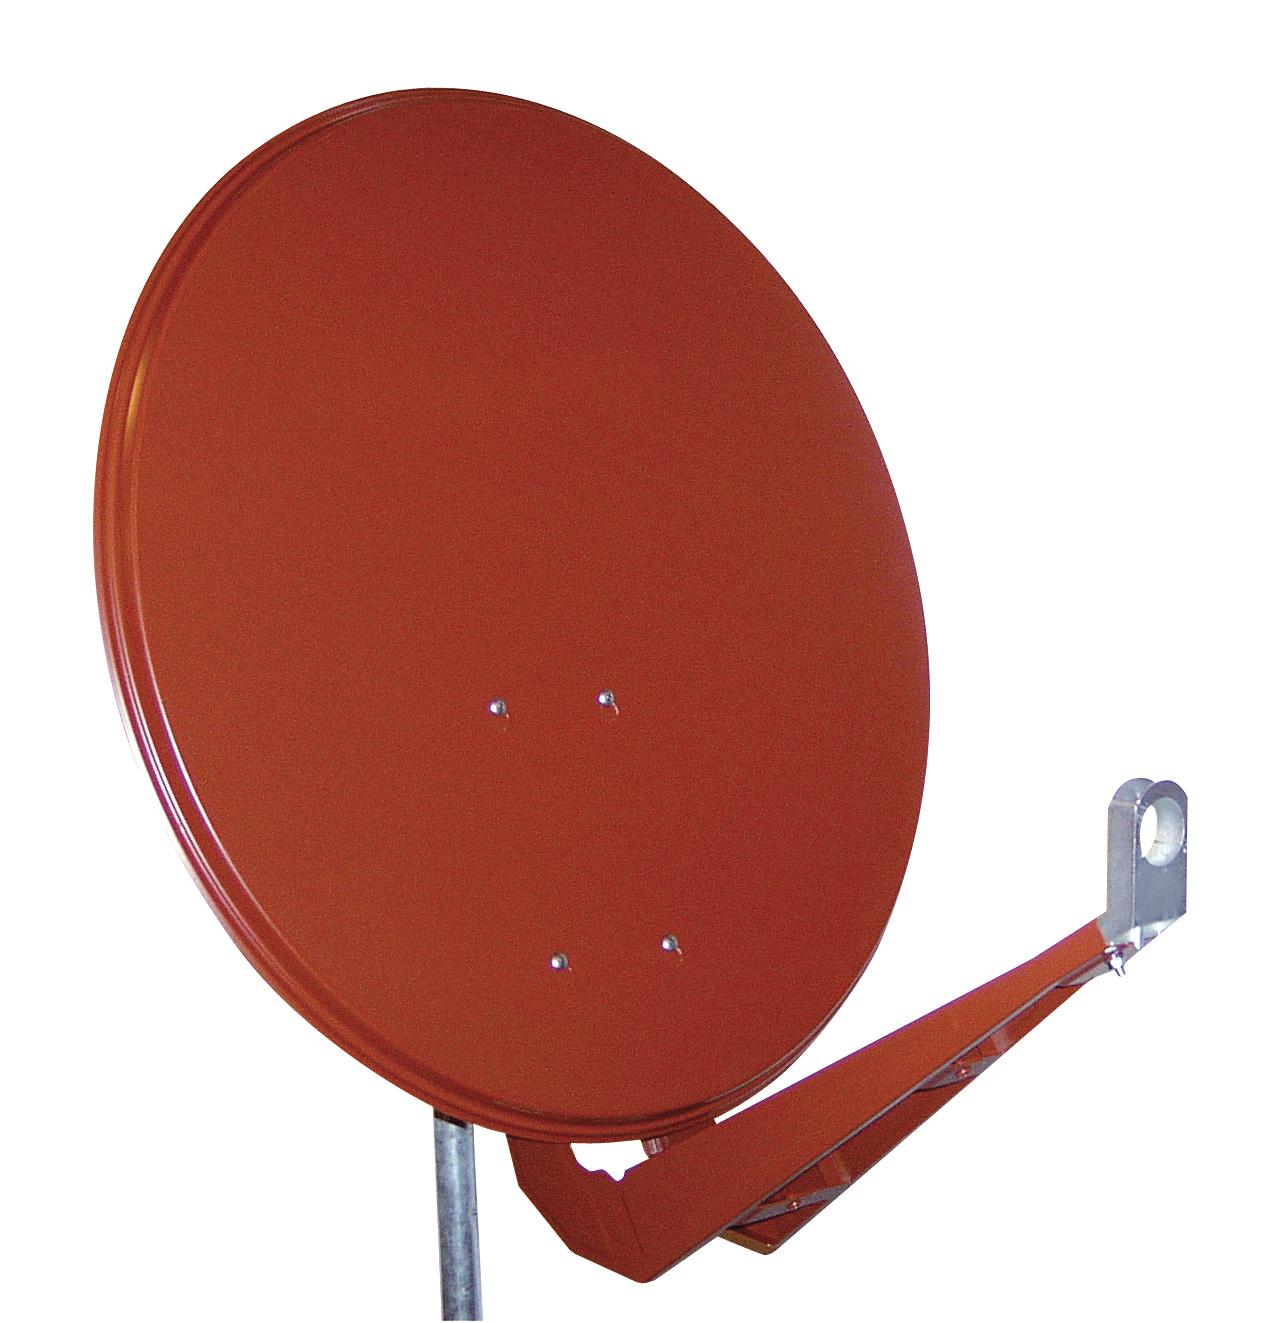 1 Stk SAT Antenne  85/80cm, Alu,40dB Gain,Doppel Monoblock Arm,Rot HSATA085AR